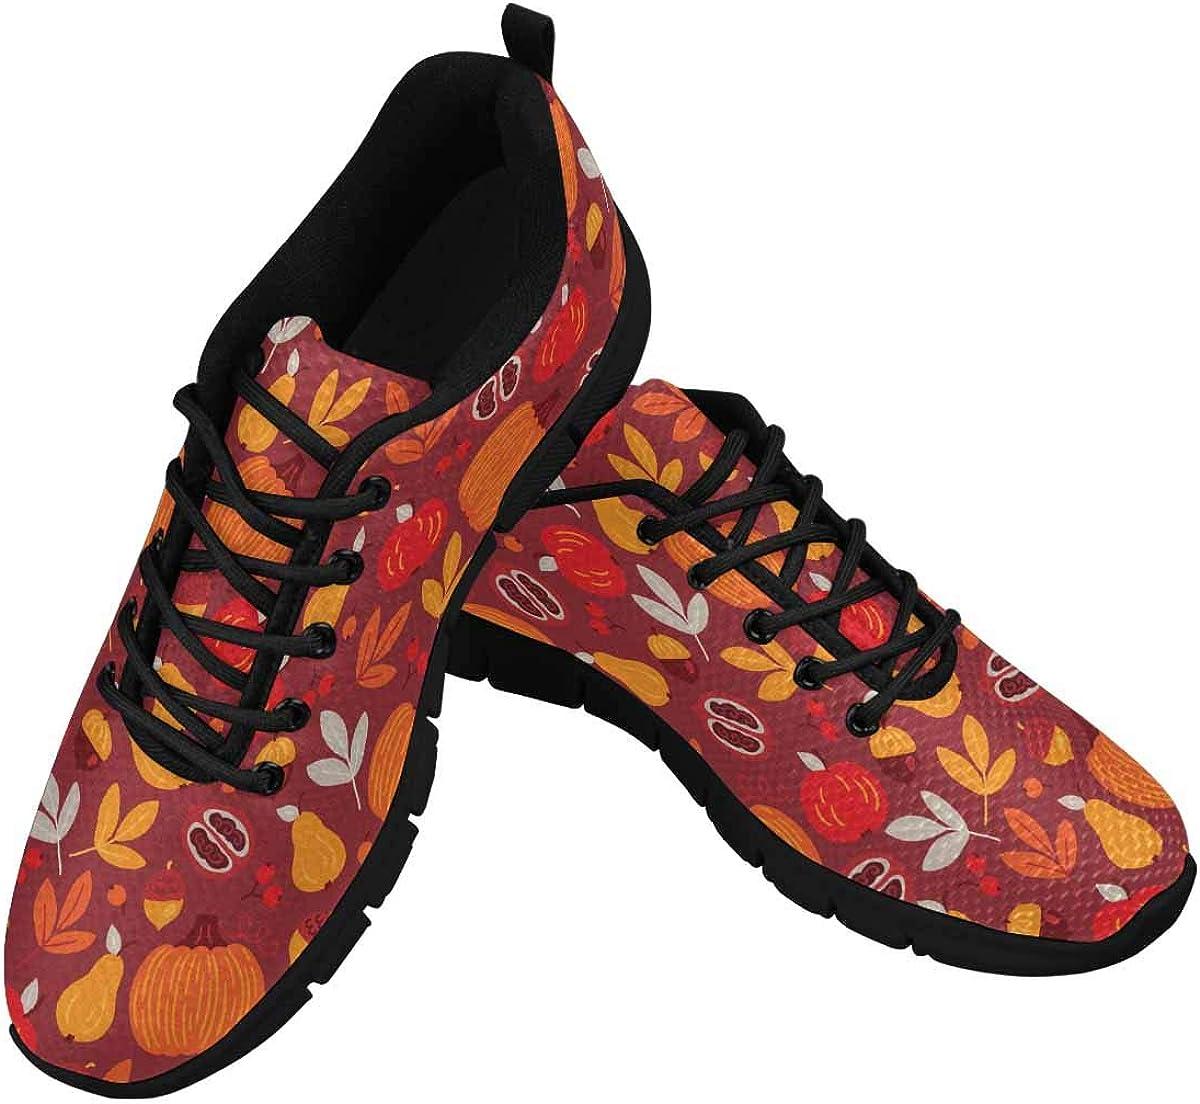 InterestPrint Thanksgiving Day Pumpkin, Leaves Women's Breathable Non Slip Sneakers